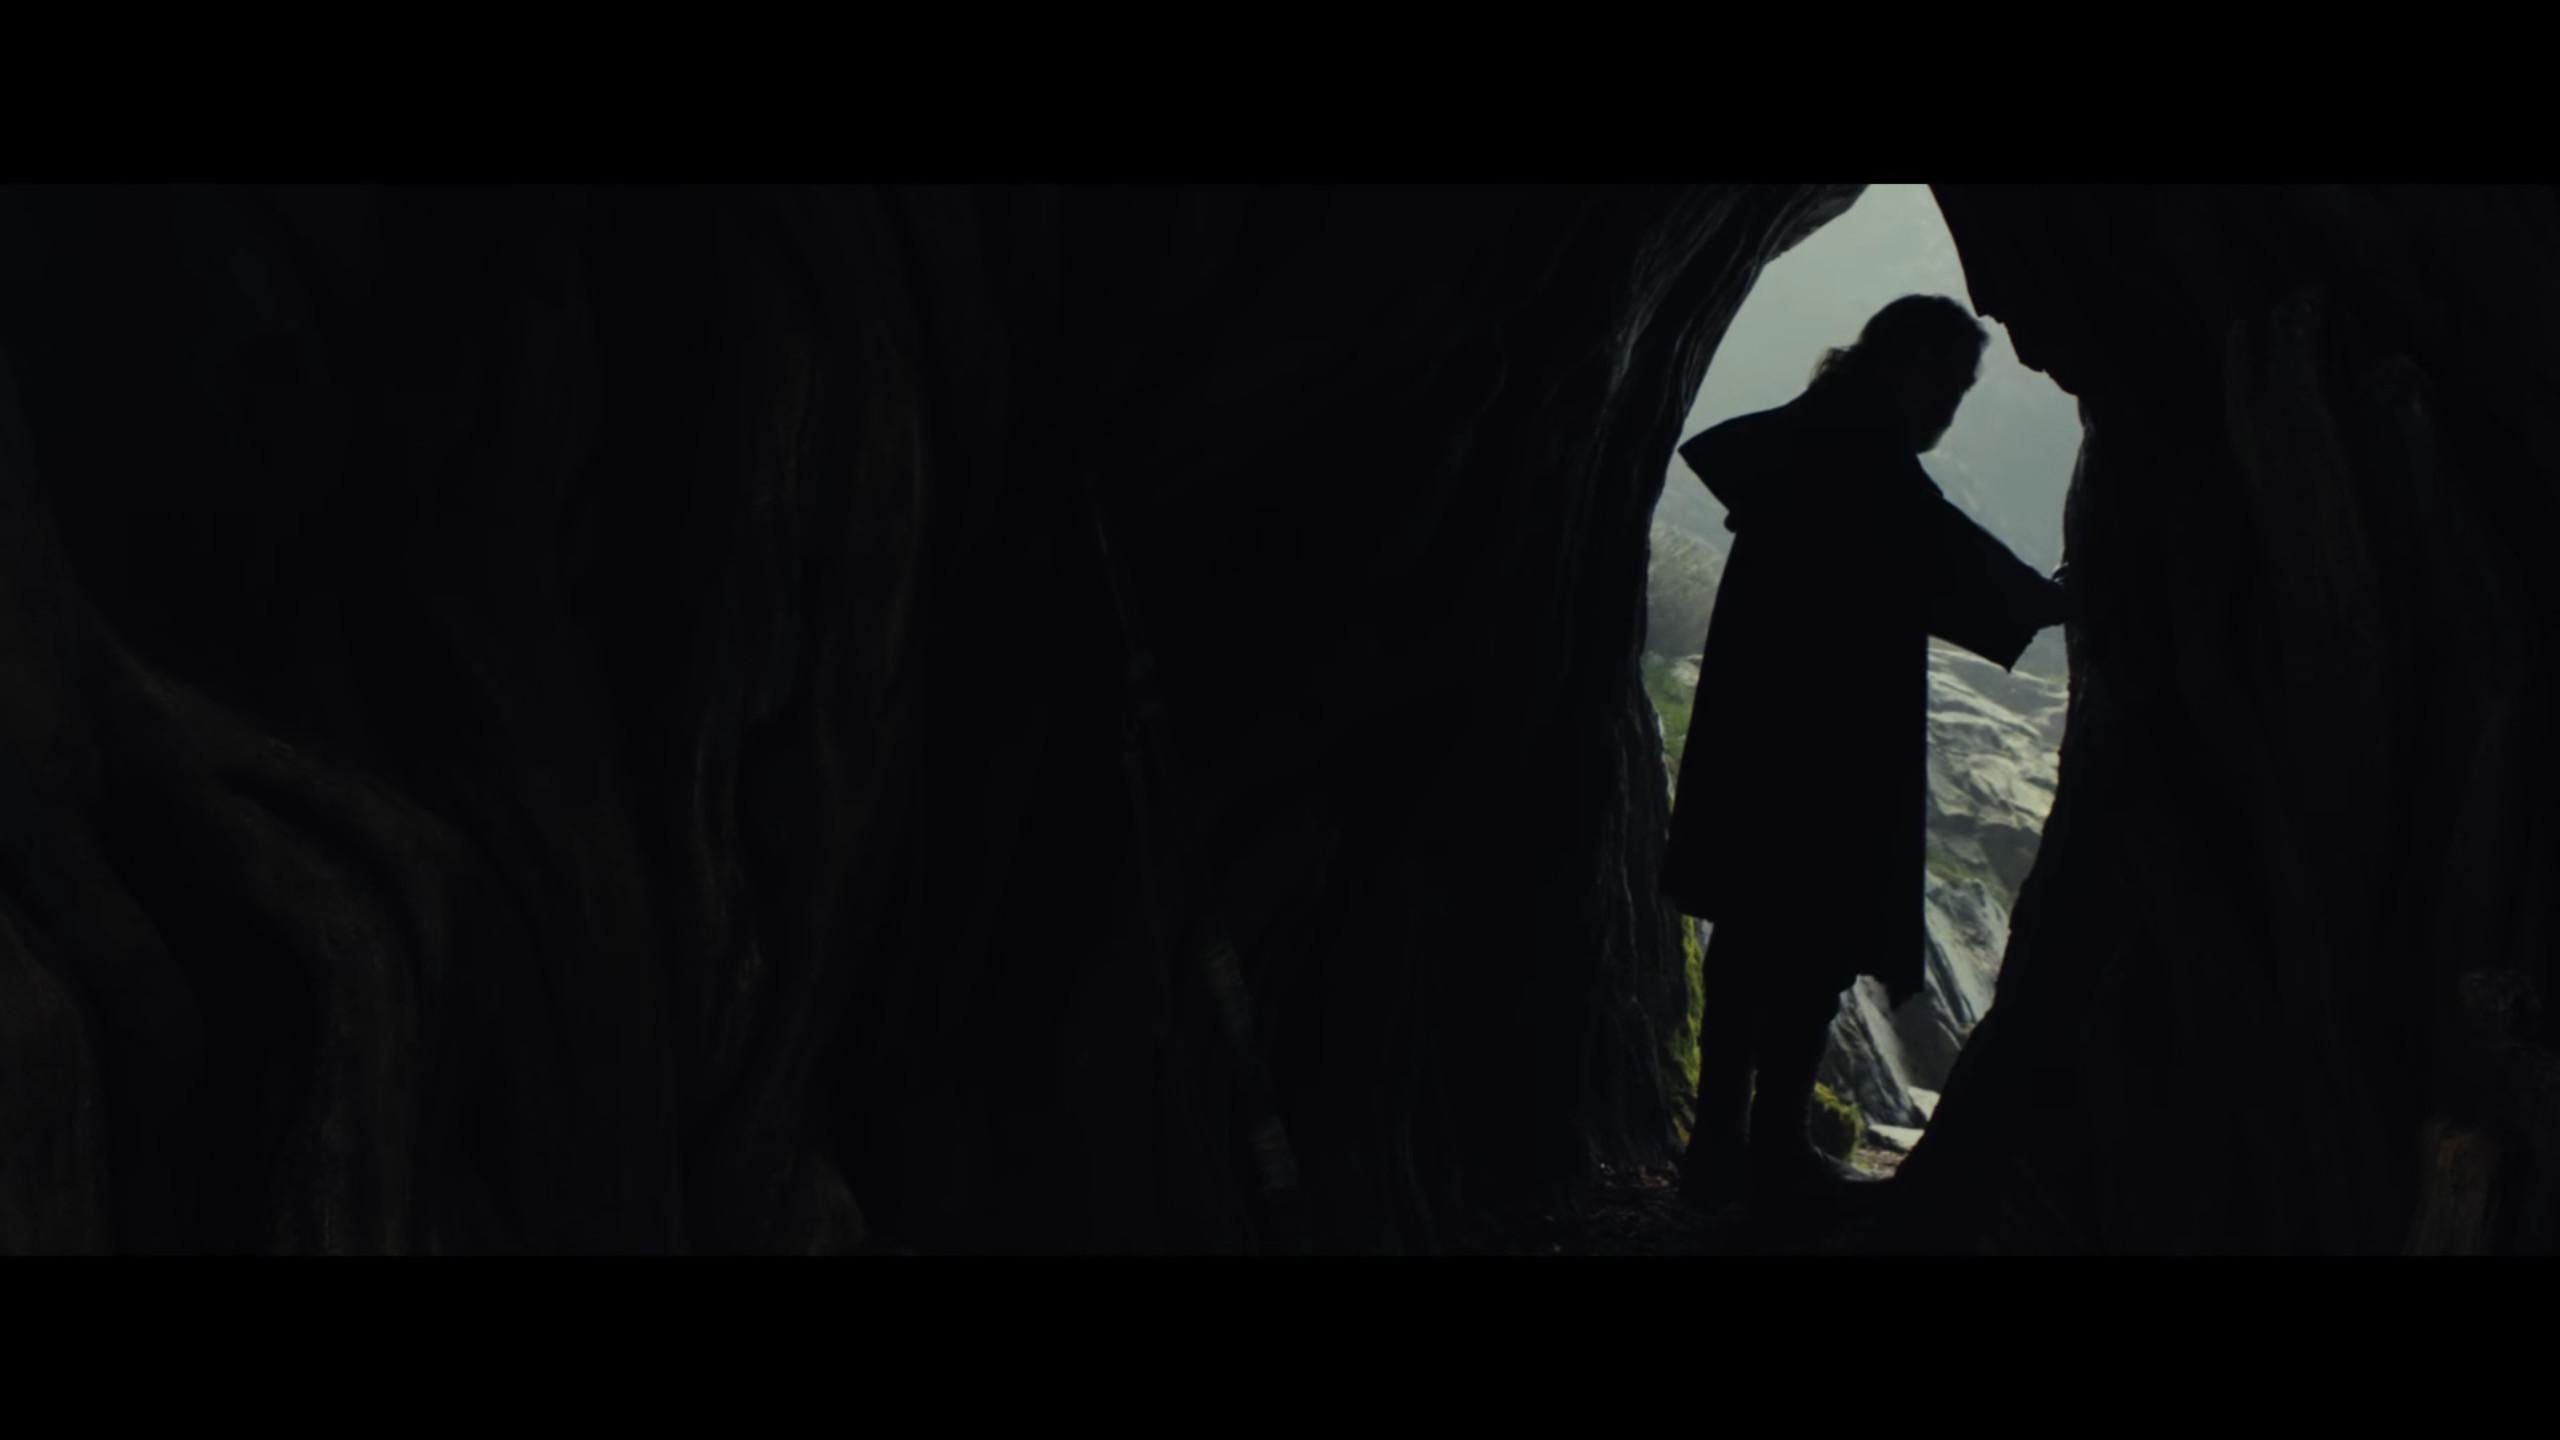 Luke Skywalker is done with the Jedi.